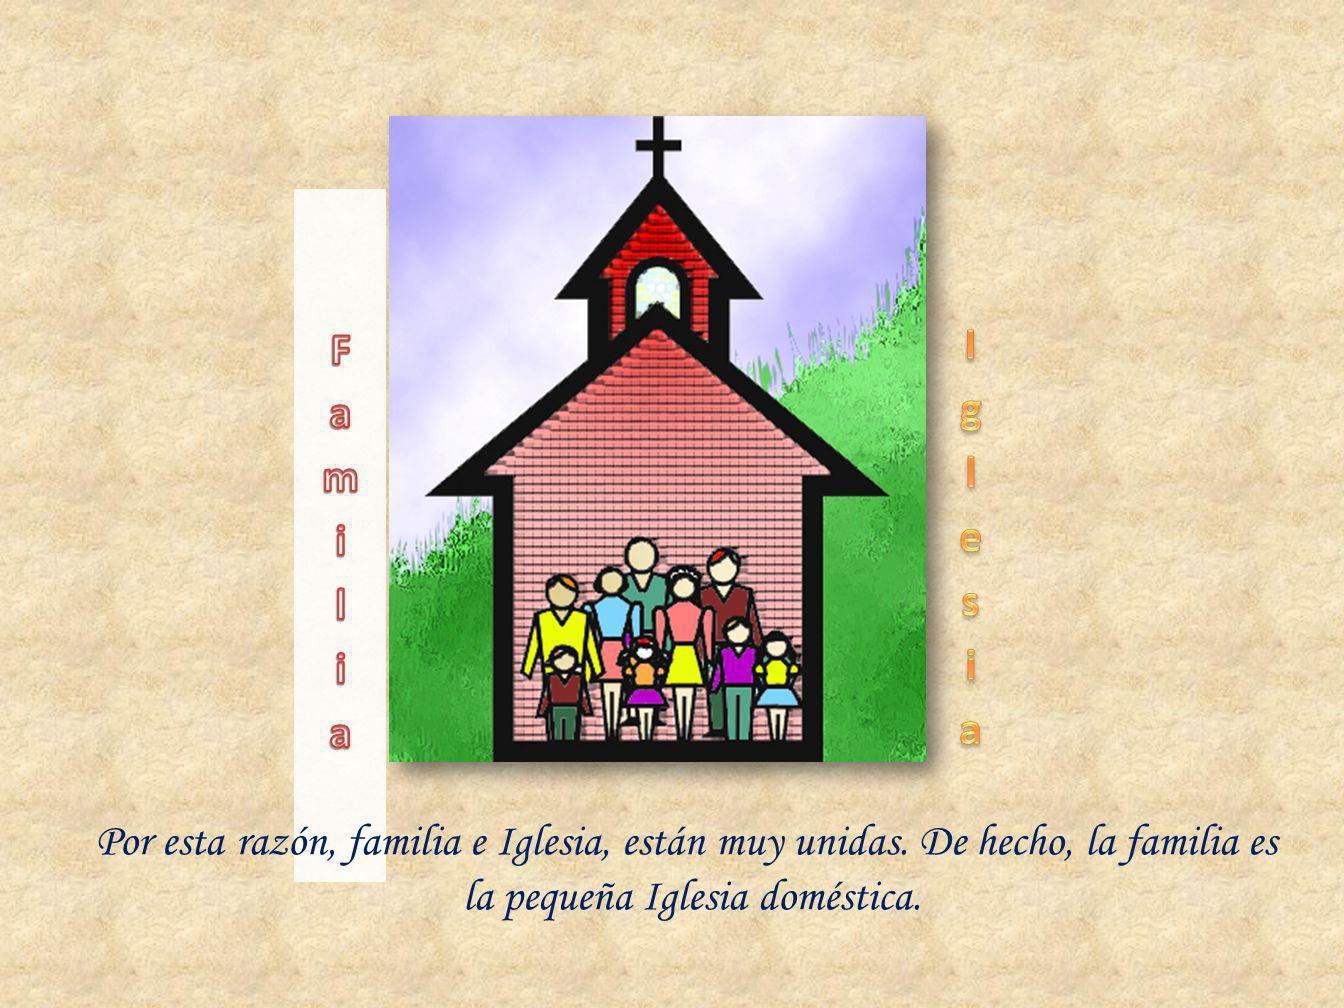 Familia Iglesia. Por esta razón, familia e Iglesia, están muy unidas.